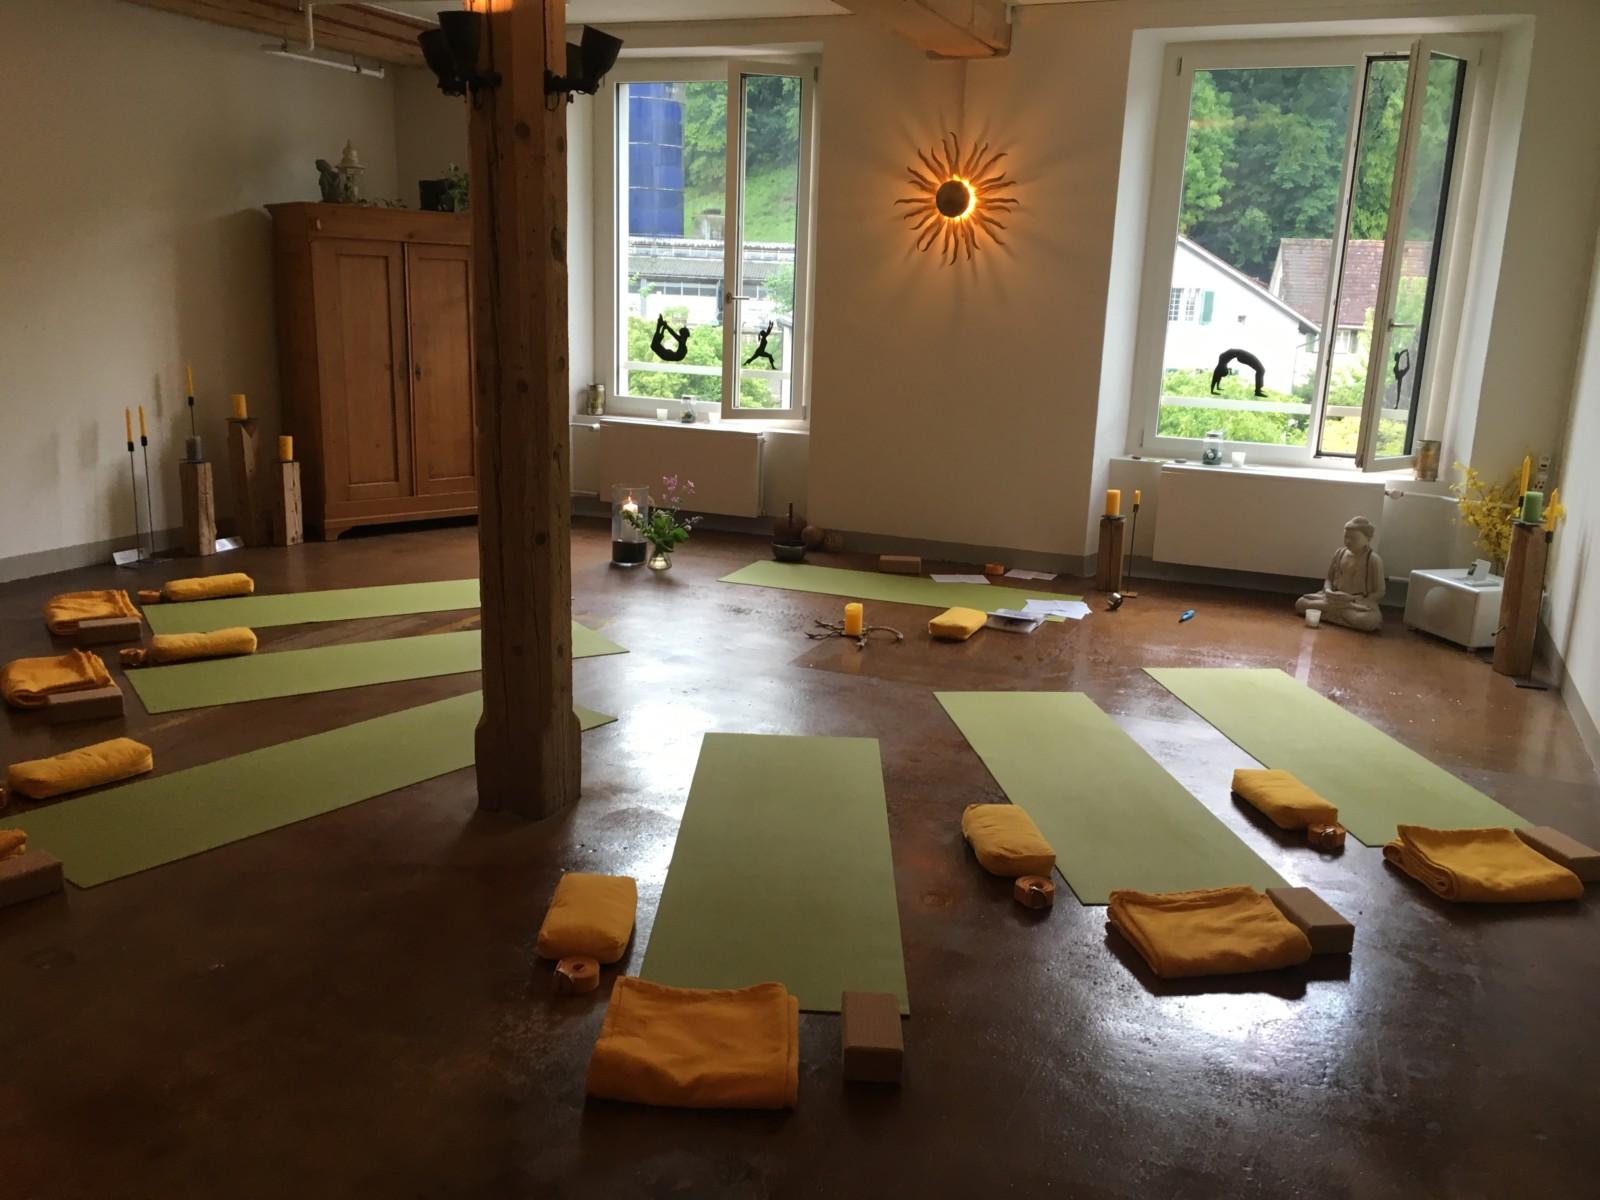 Varuna Yoga Raum Sandra Wipf